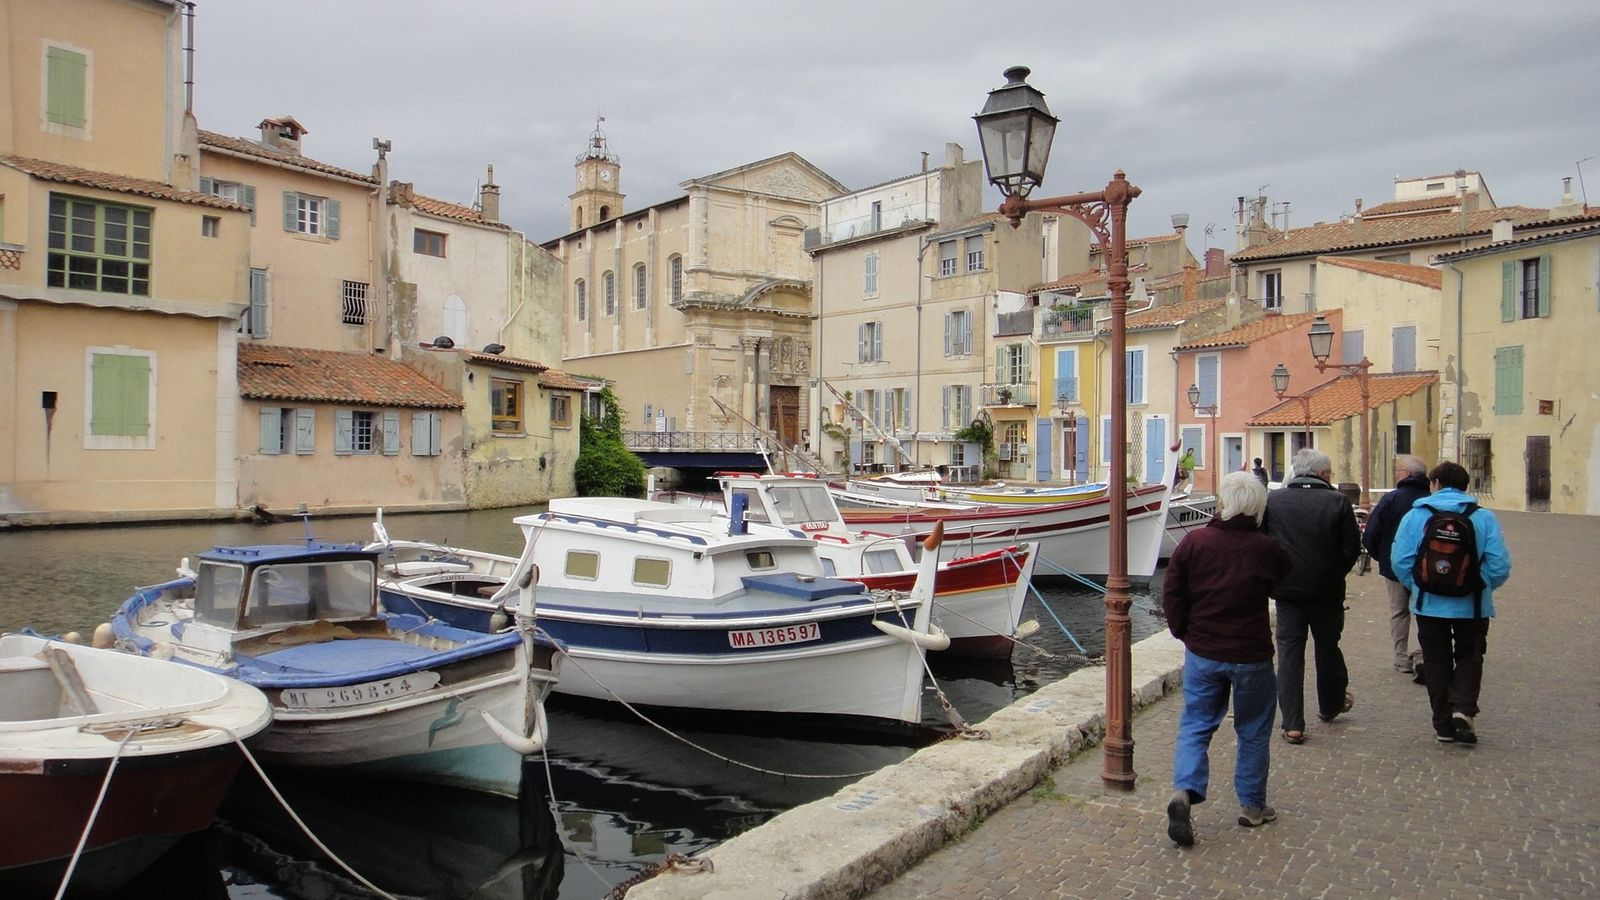 Méditerranée 2013 : Martigues - Etang de Berre